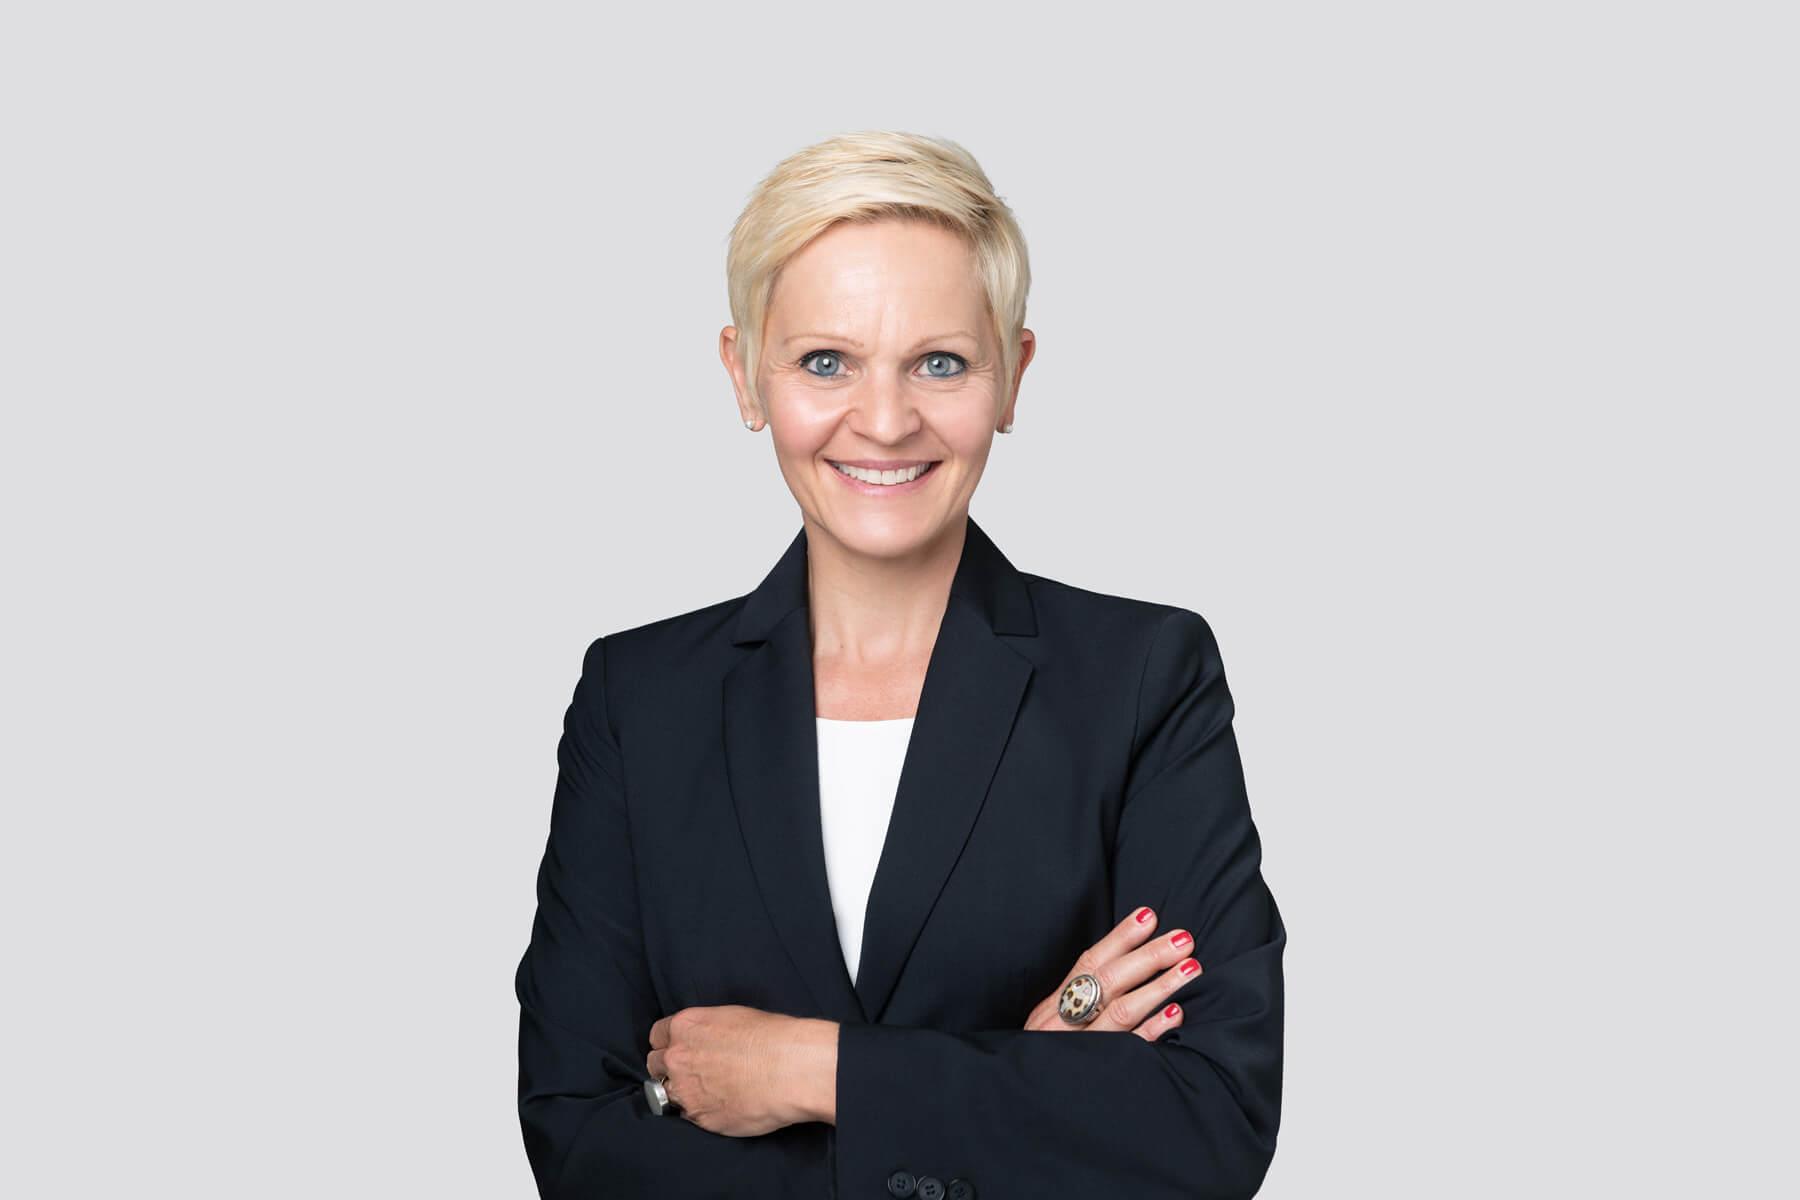 Séverine Marty - Office Manager